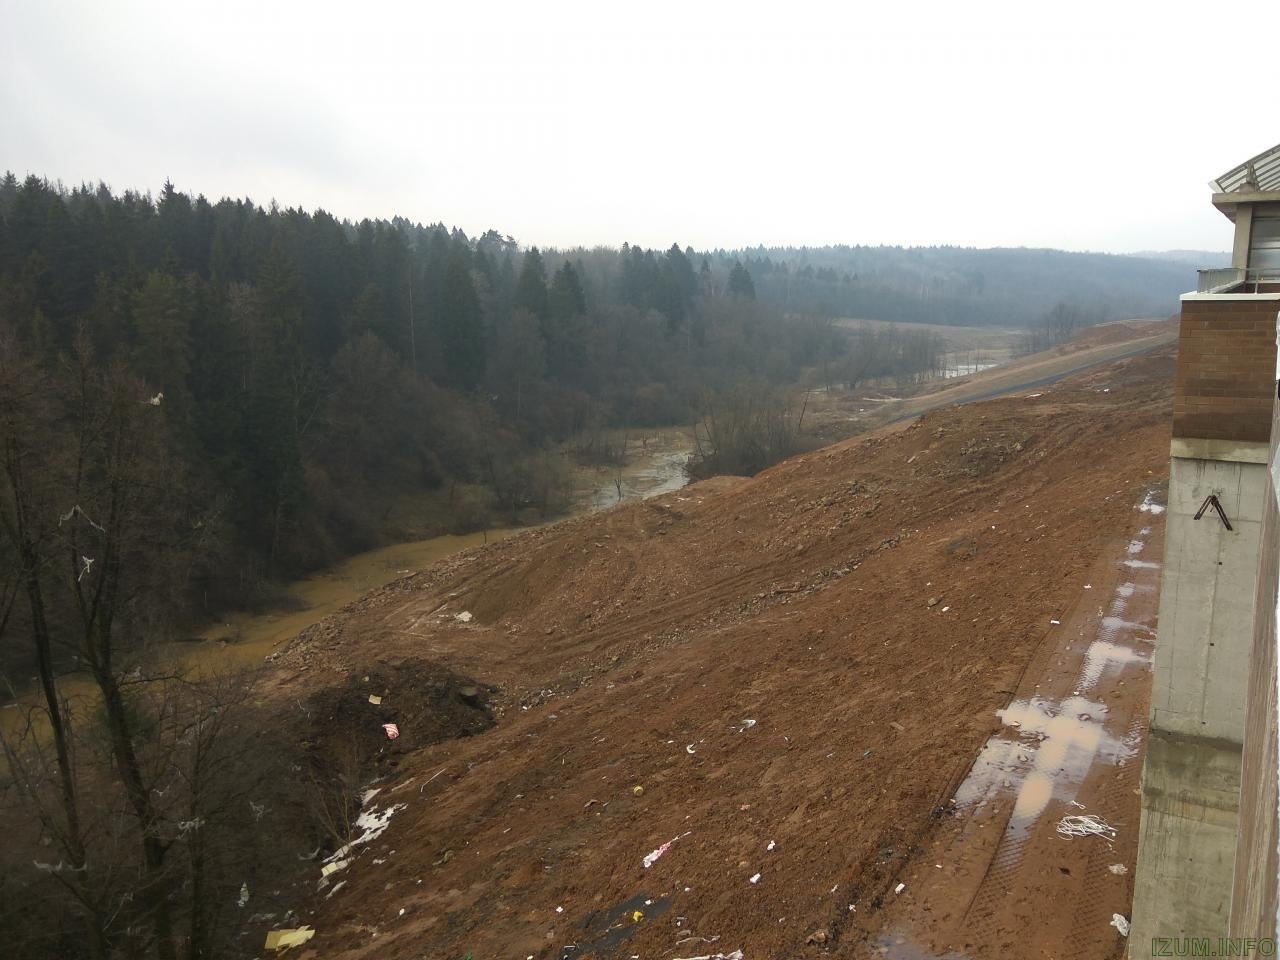 Берег речки банька в Изумрудных холмах за корпусом 15 (4).jpg